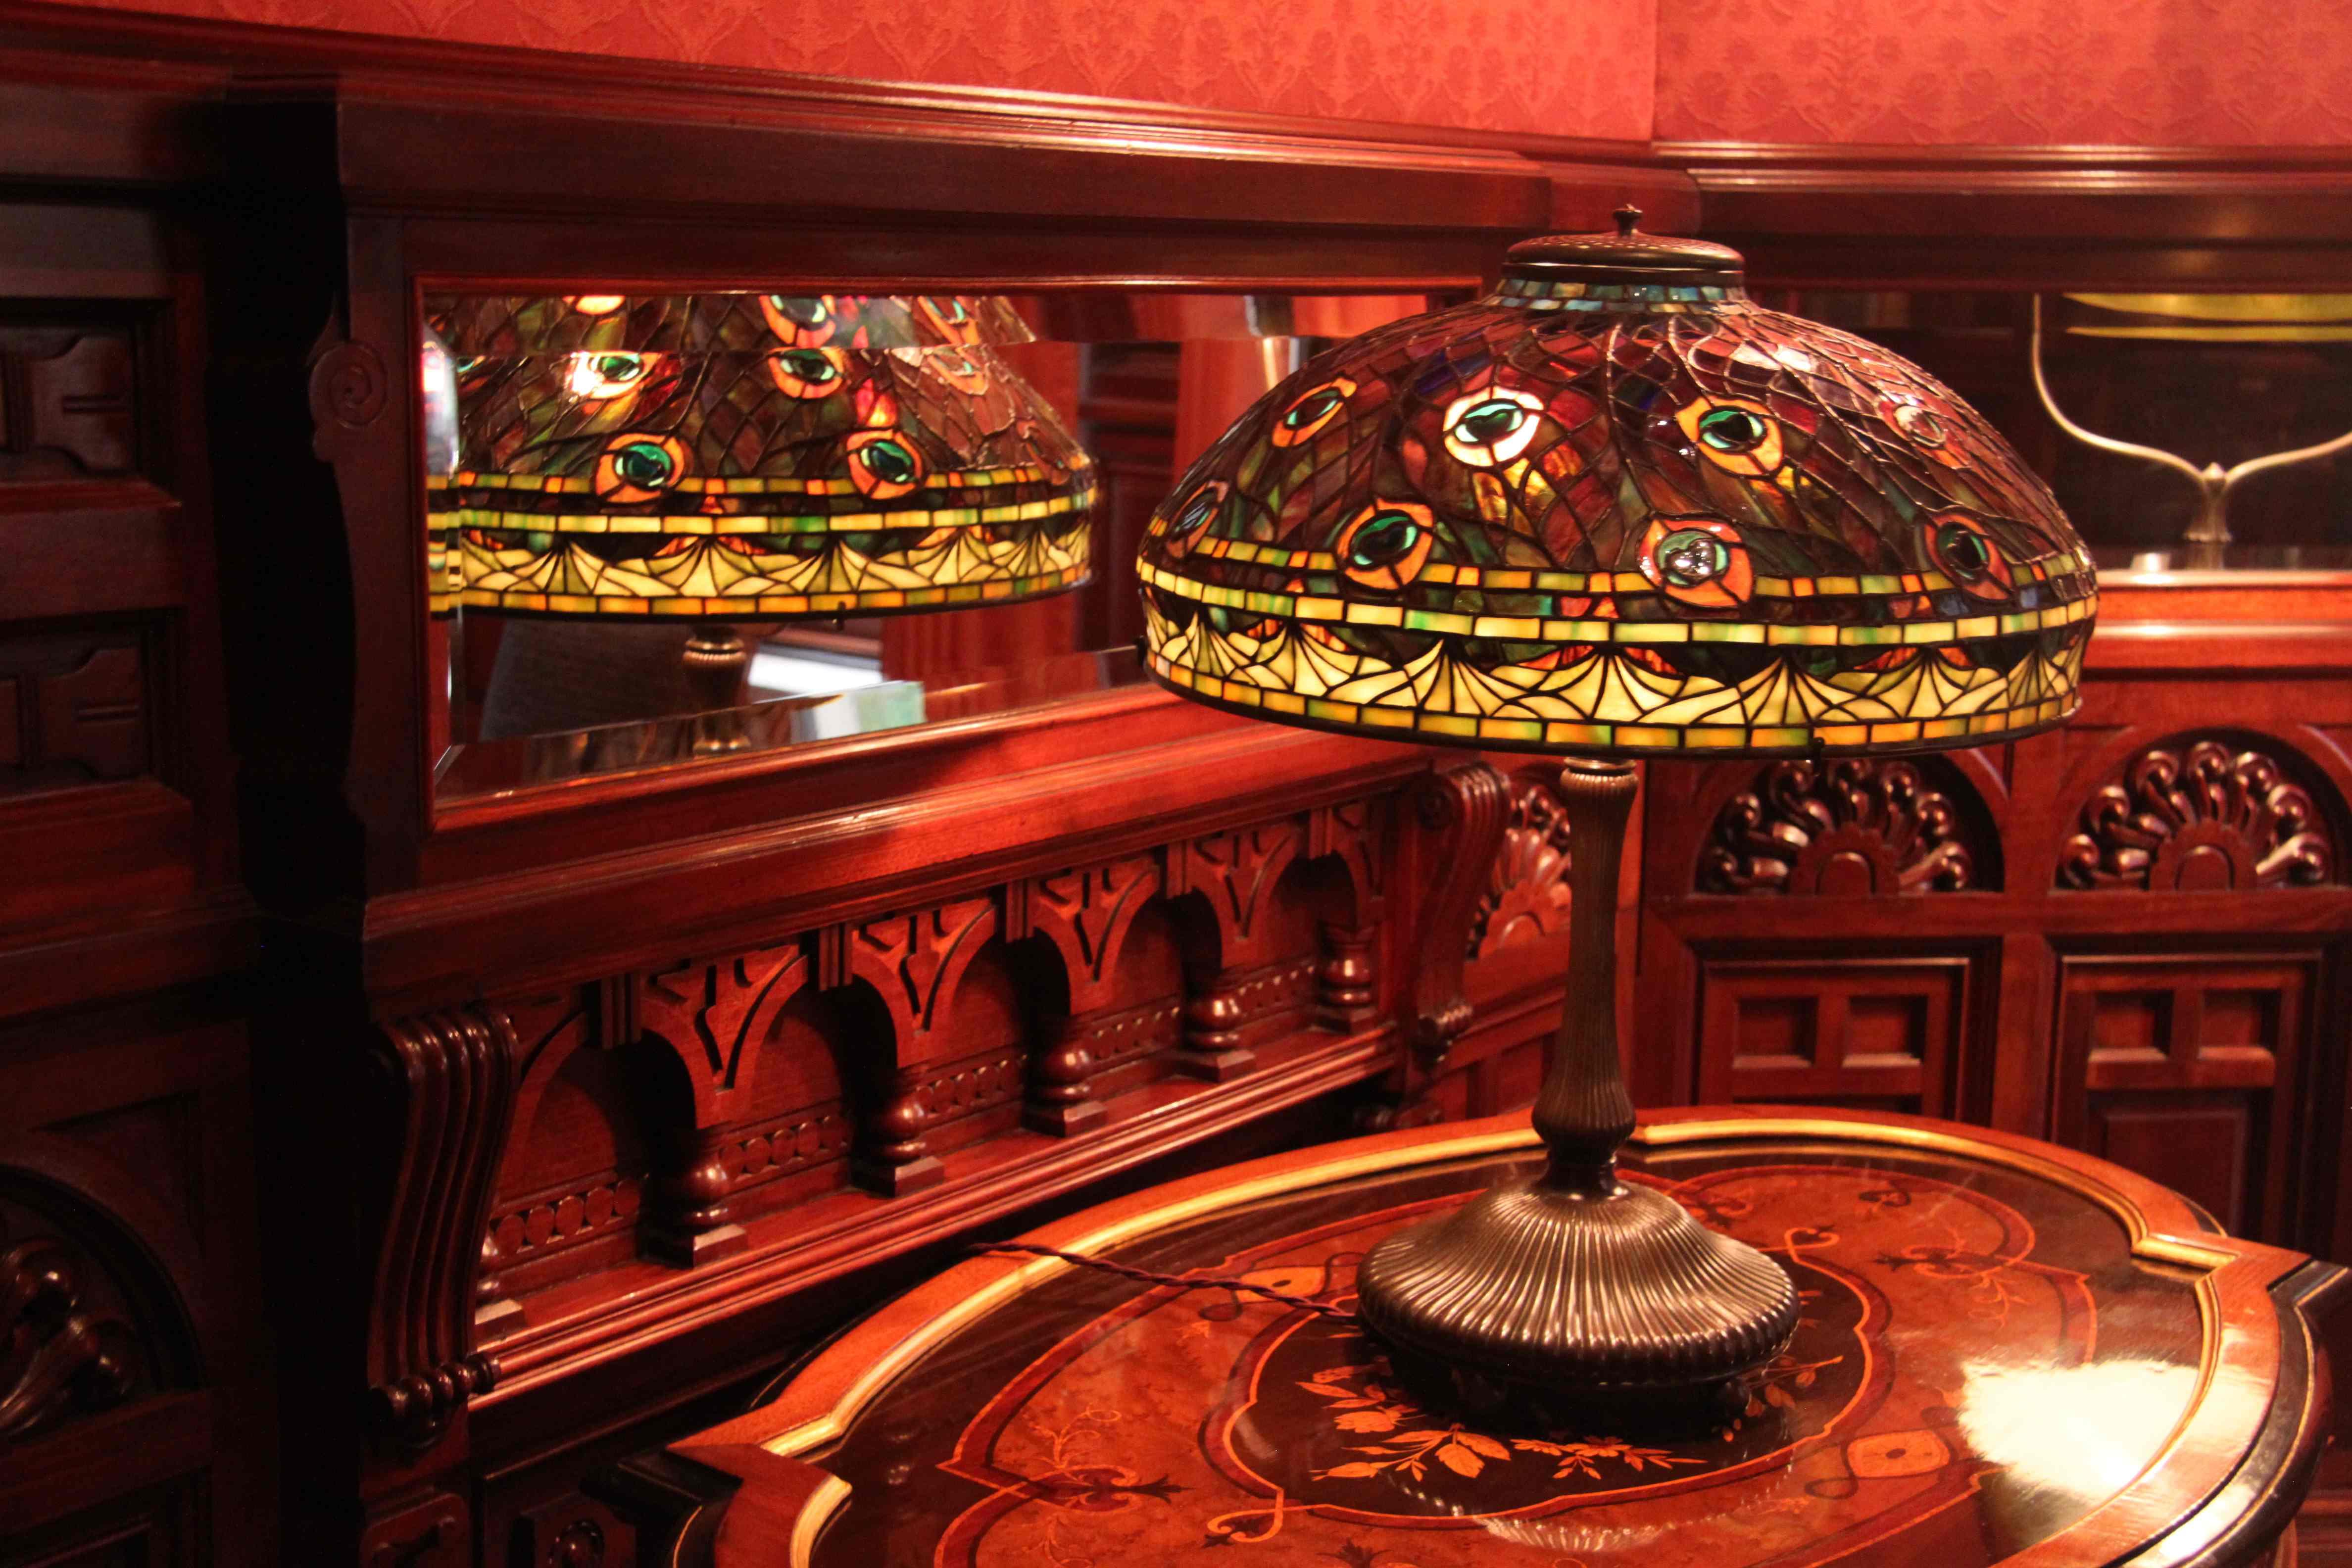 tiffany lamp. Black Bedroom Furniture Sets. Home Design Ideas